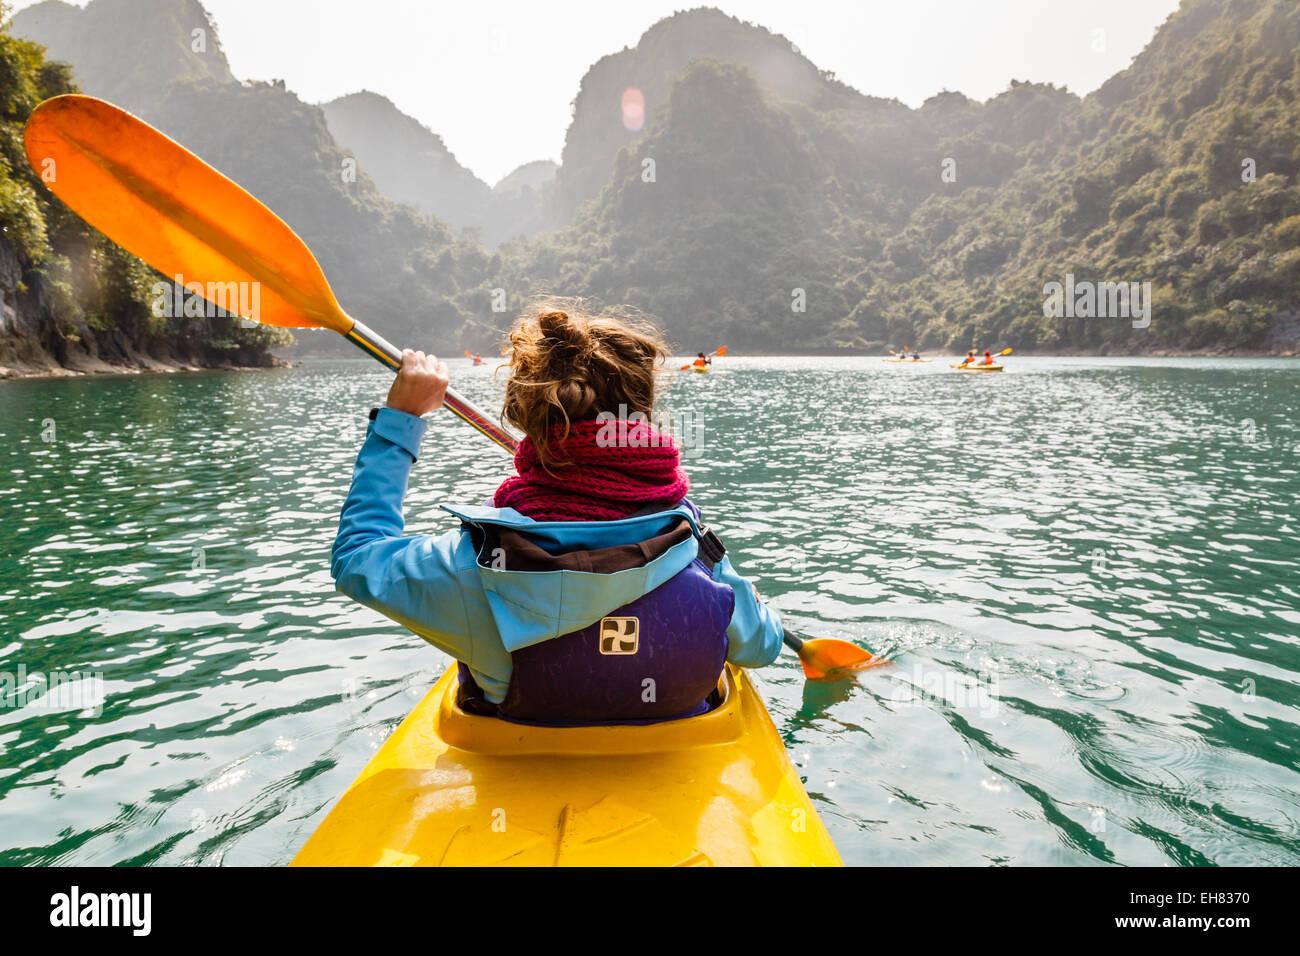 Woman kayaking at Halong Bay, Vietnam, Indochina, Southeast Asia, Asia - Stock Image